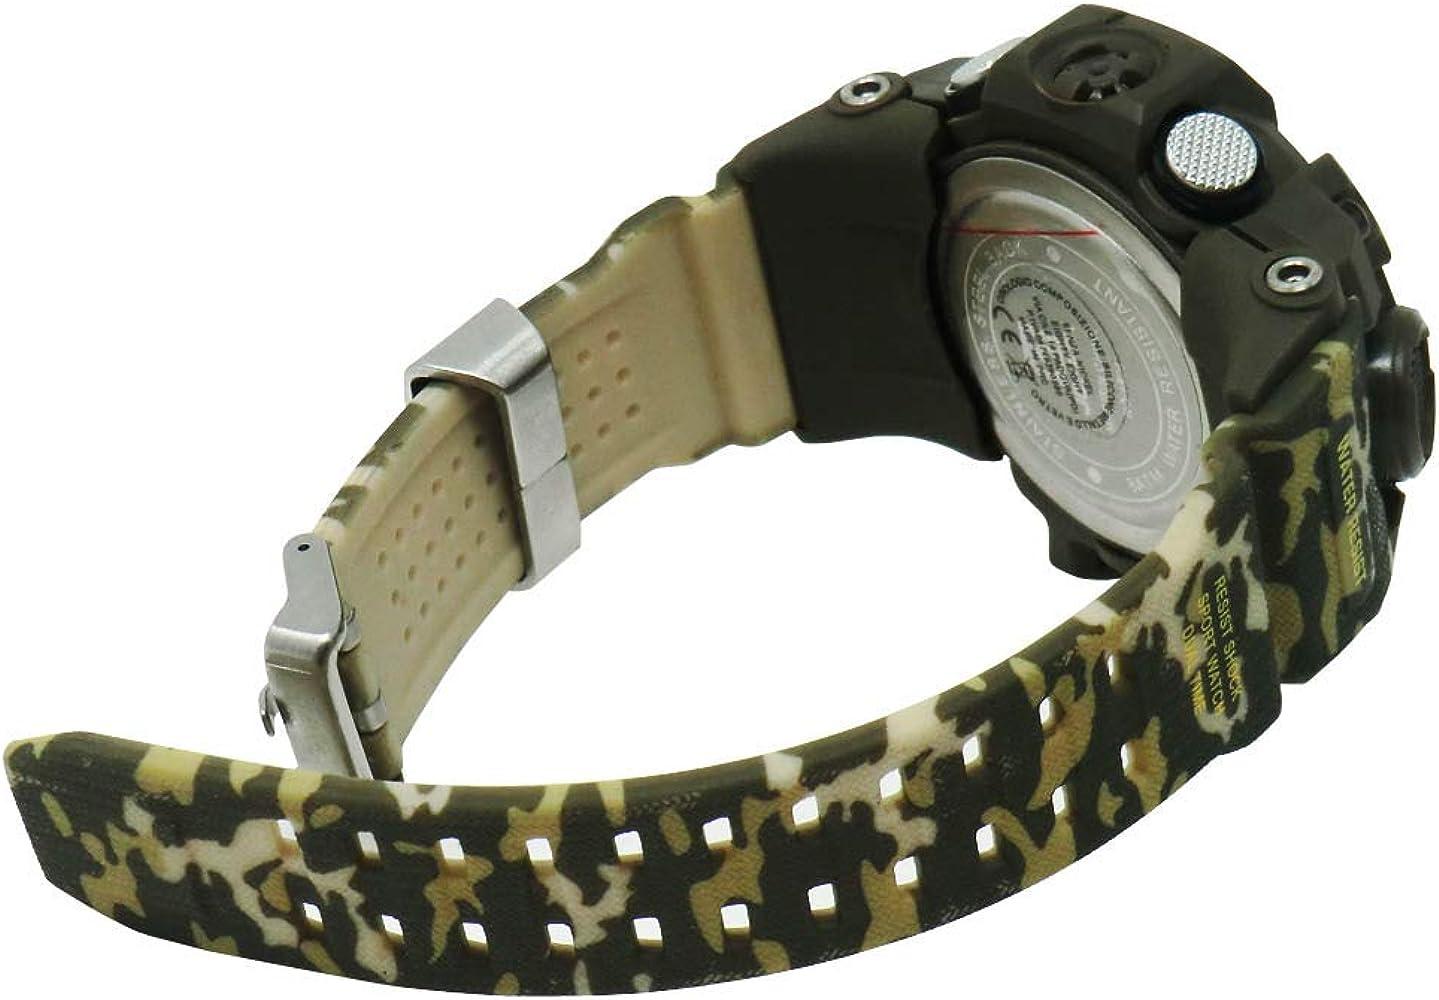 Joefox Reloj De Pulsera Digital para Hombre, Analógico Deportivo Militar, Cronógrafo Digital, Correa De Resina Led Resistente Al Agua 50 MT (Color: Oscuro Militar): Amazon.es: Relojes